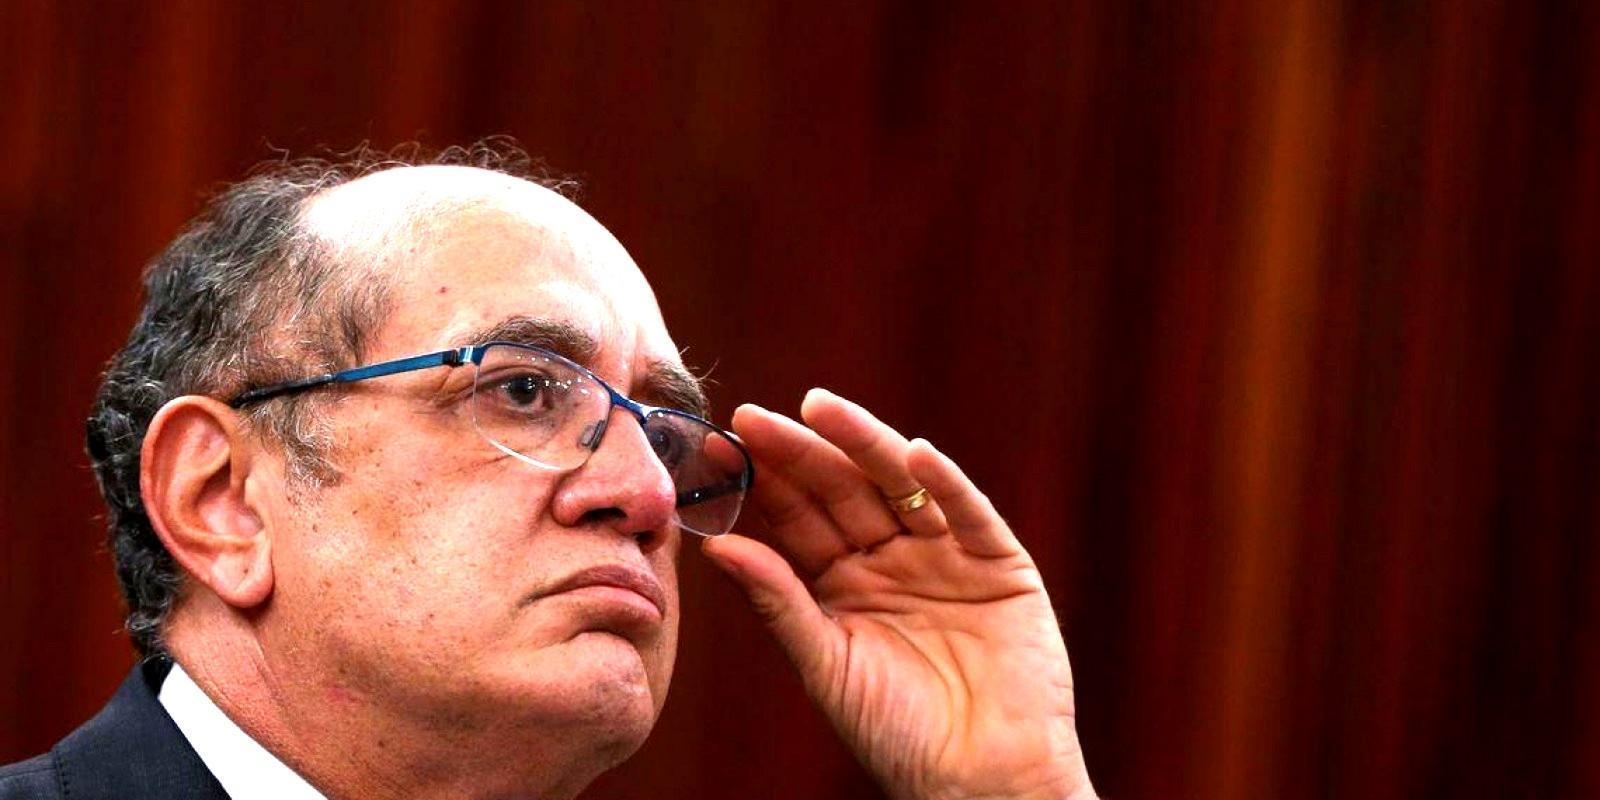 Está na hora de a PGR tomar providências, diz Gilmar sobre Lava Jato